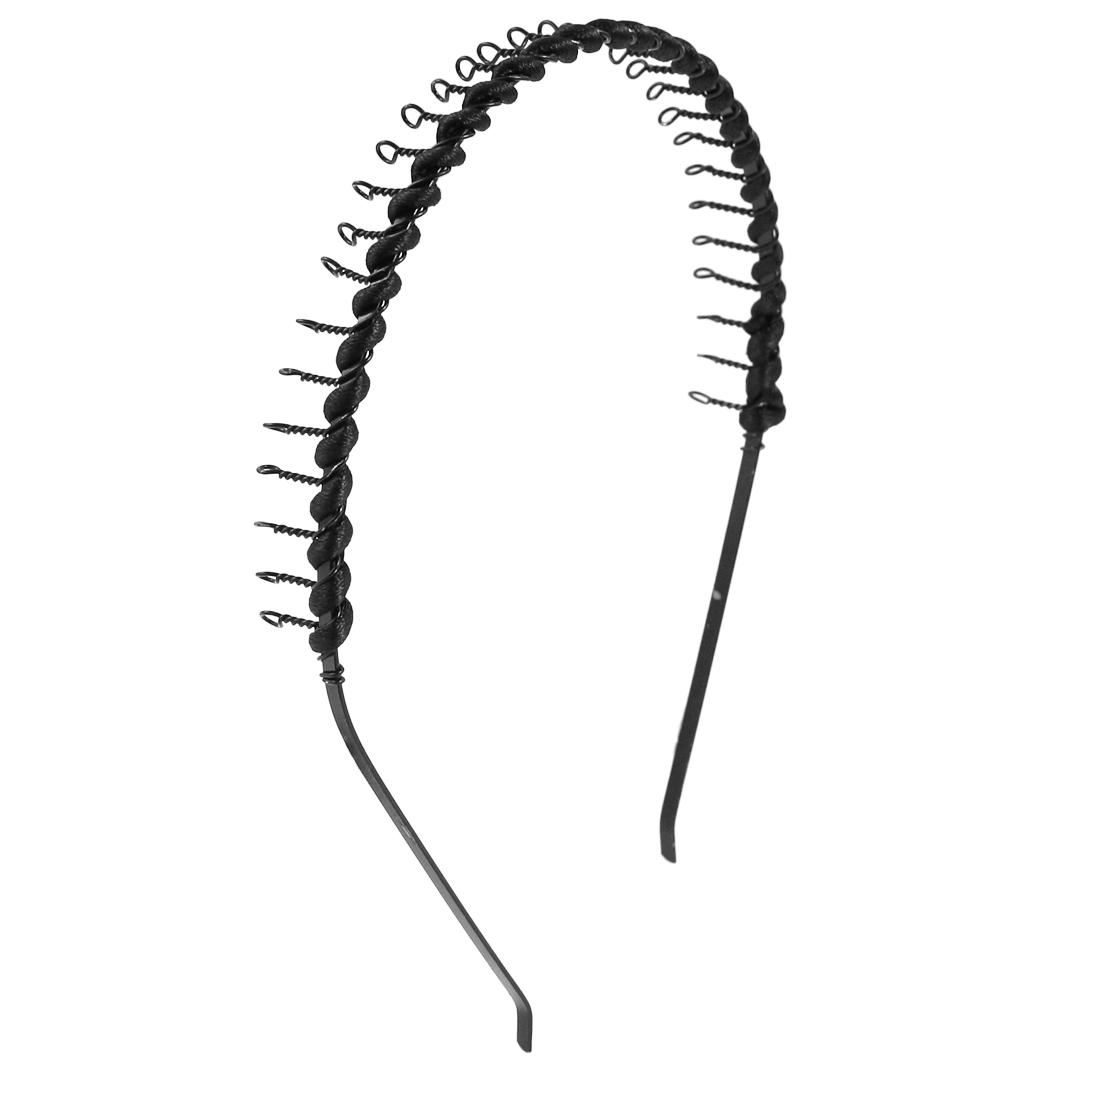 2 Pcs Black Metal Teeth Hair Hoop Headband Decor for Lady